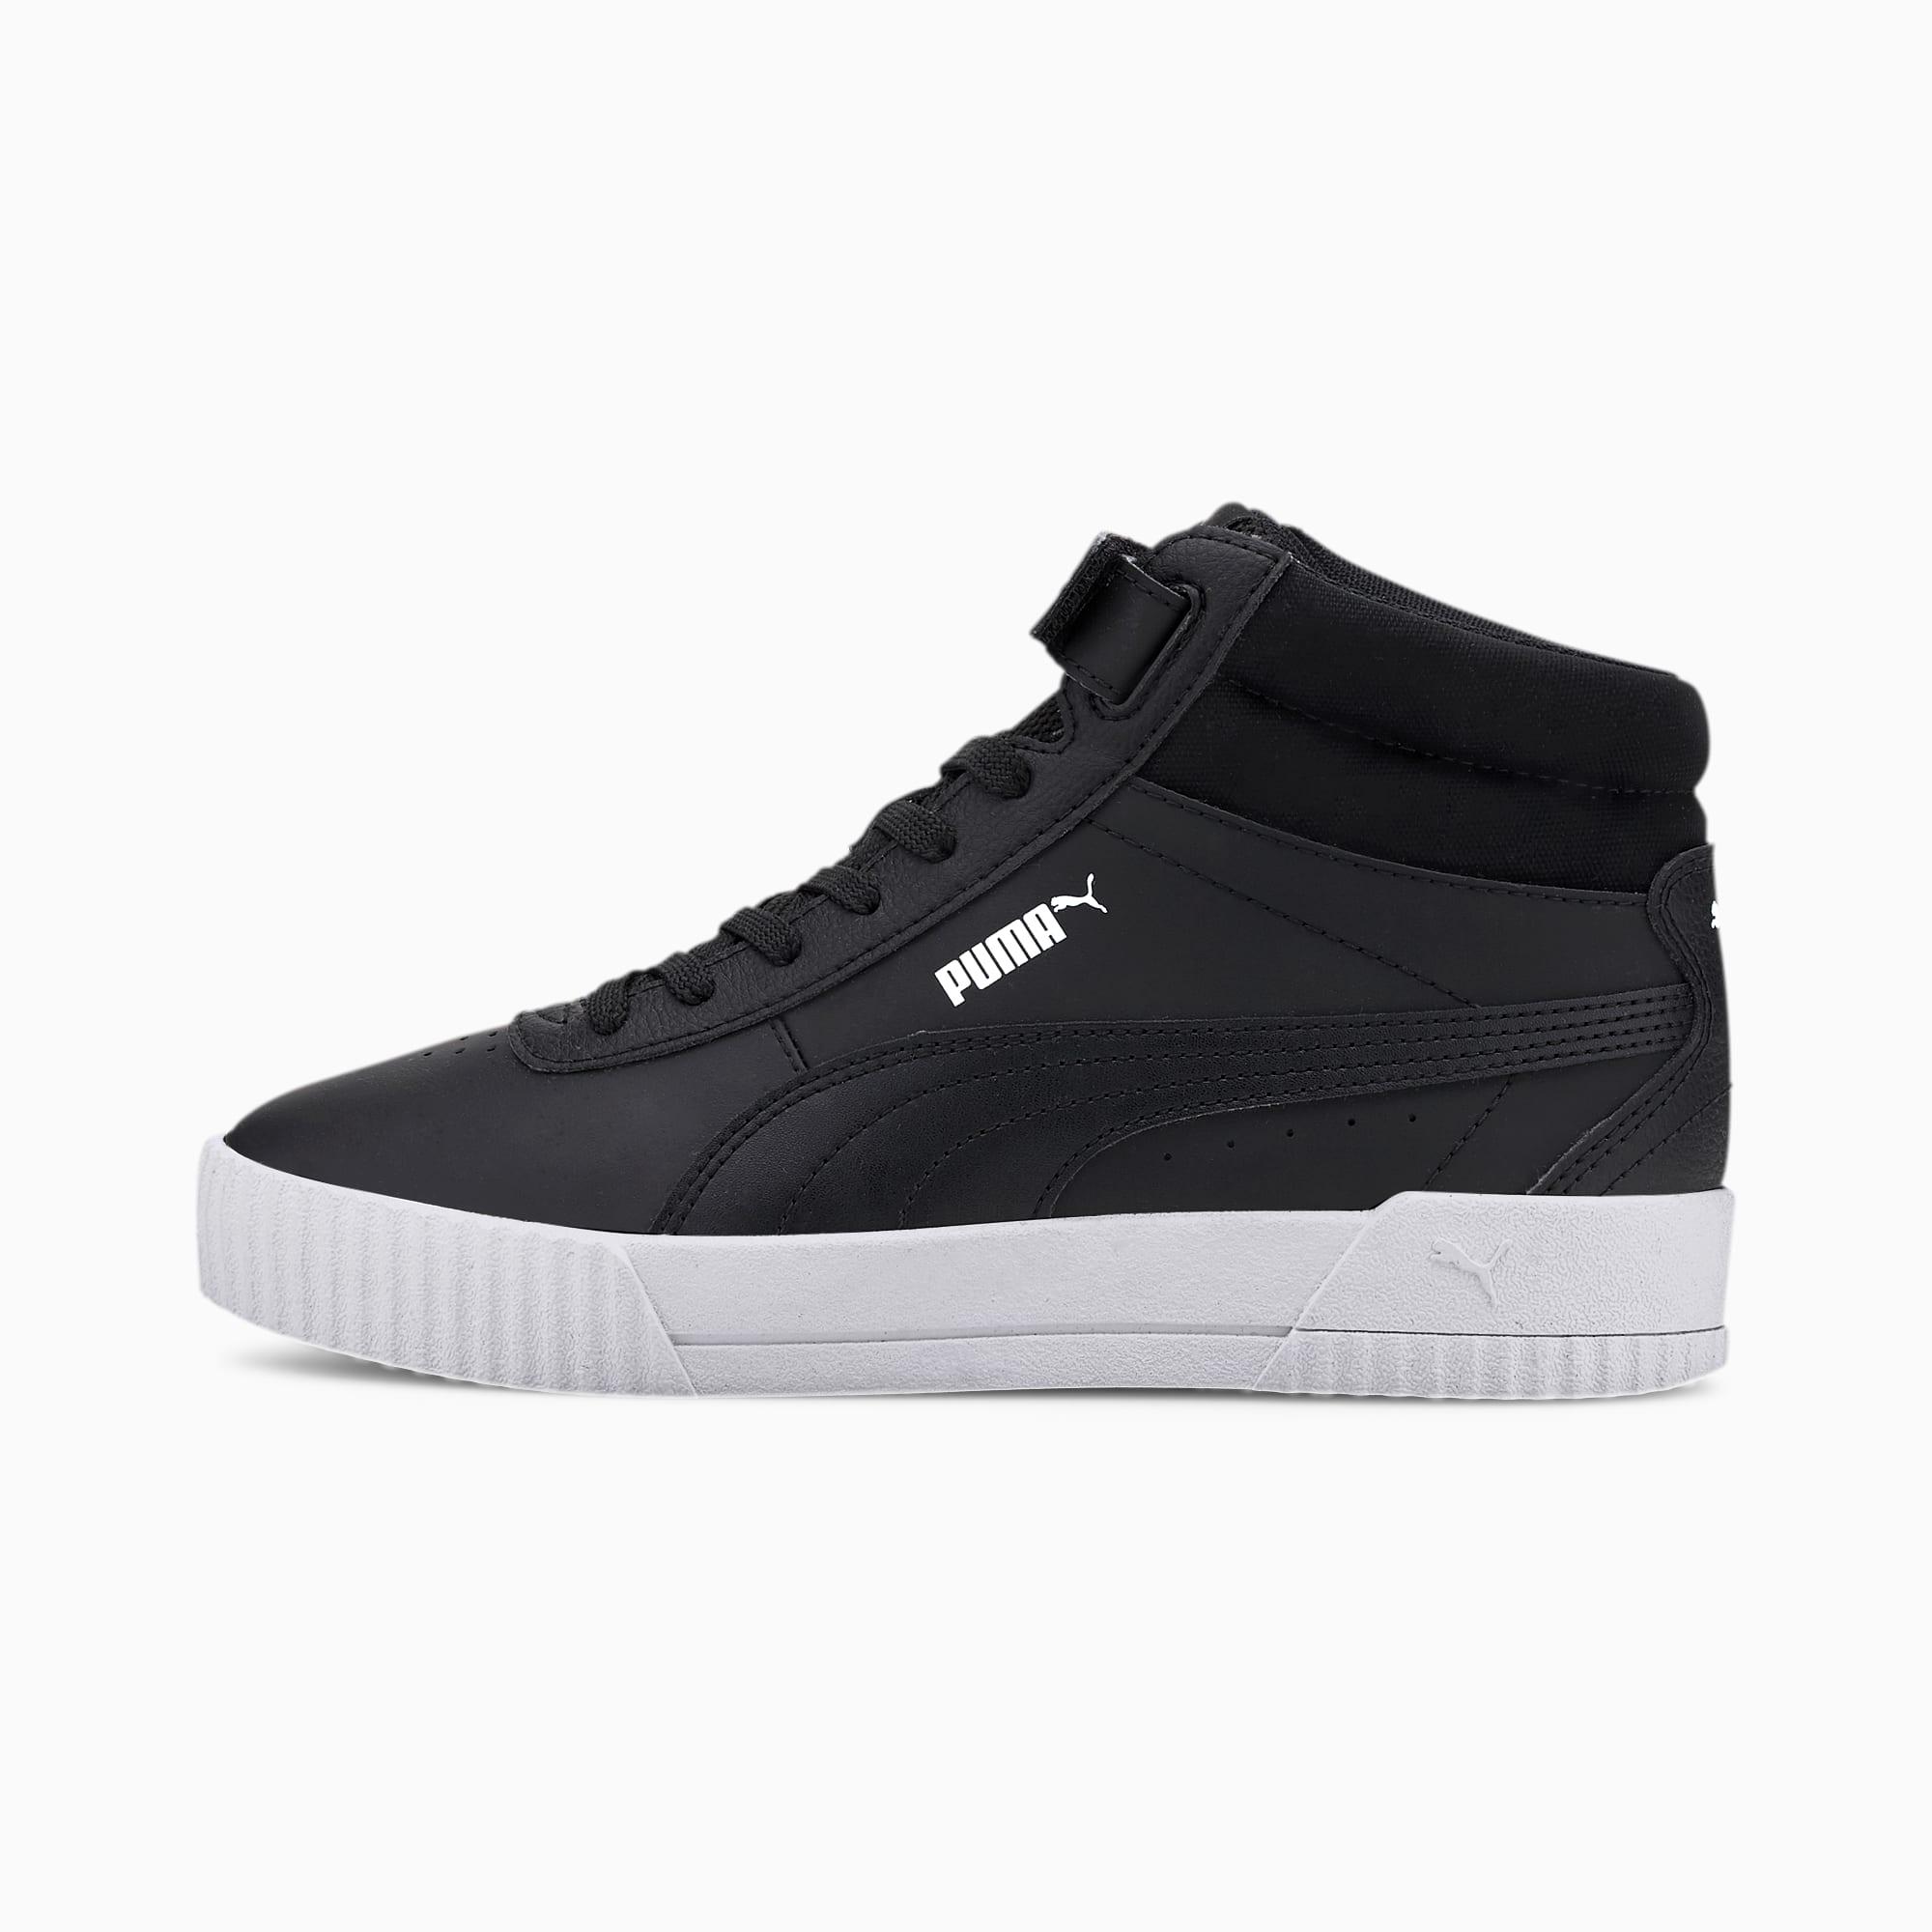 PUMA Chaussure Basket montante Carina femme, Noir, Taille 36, Chaussures